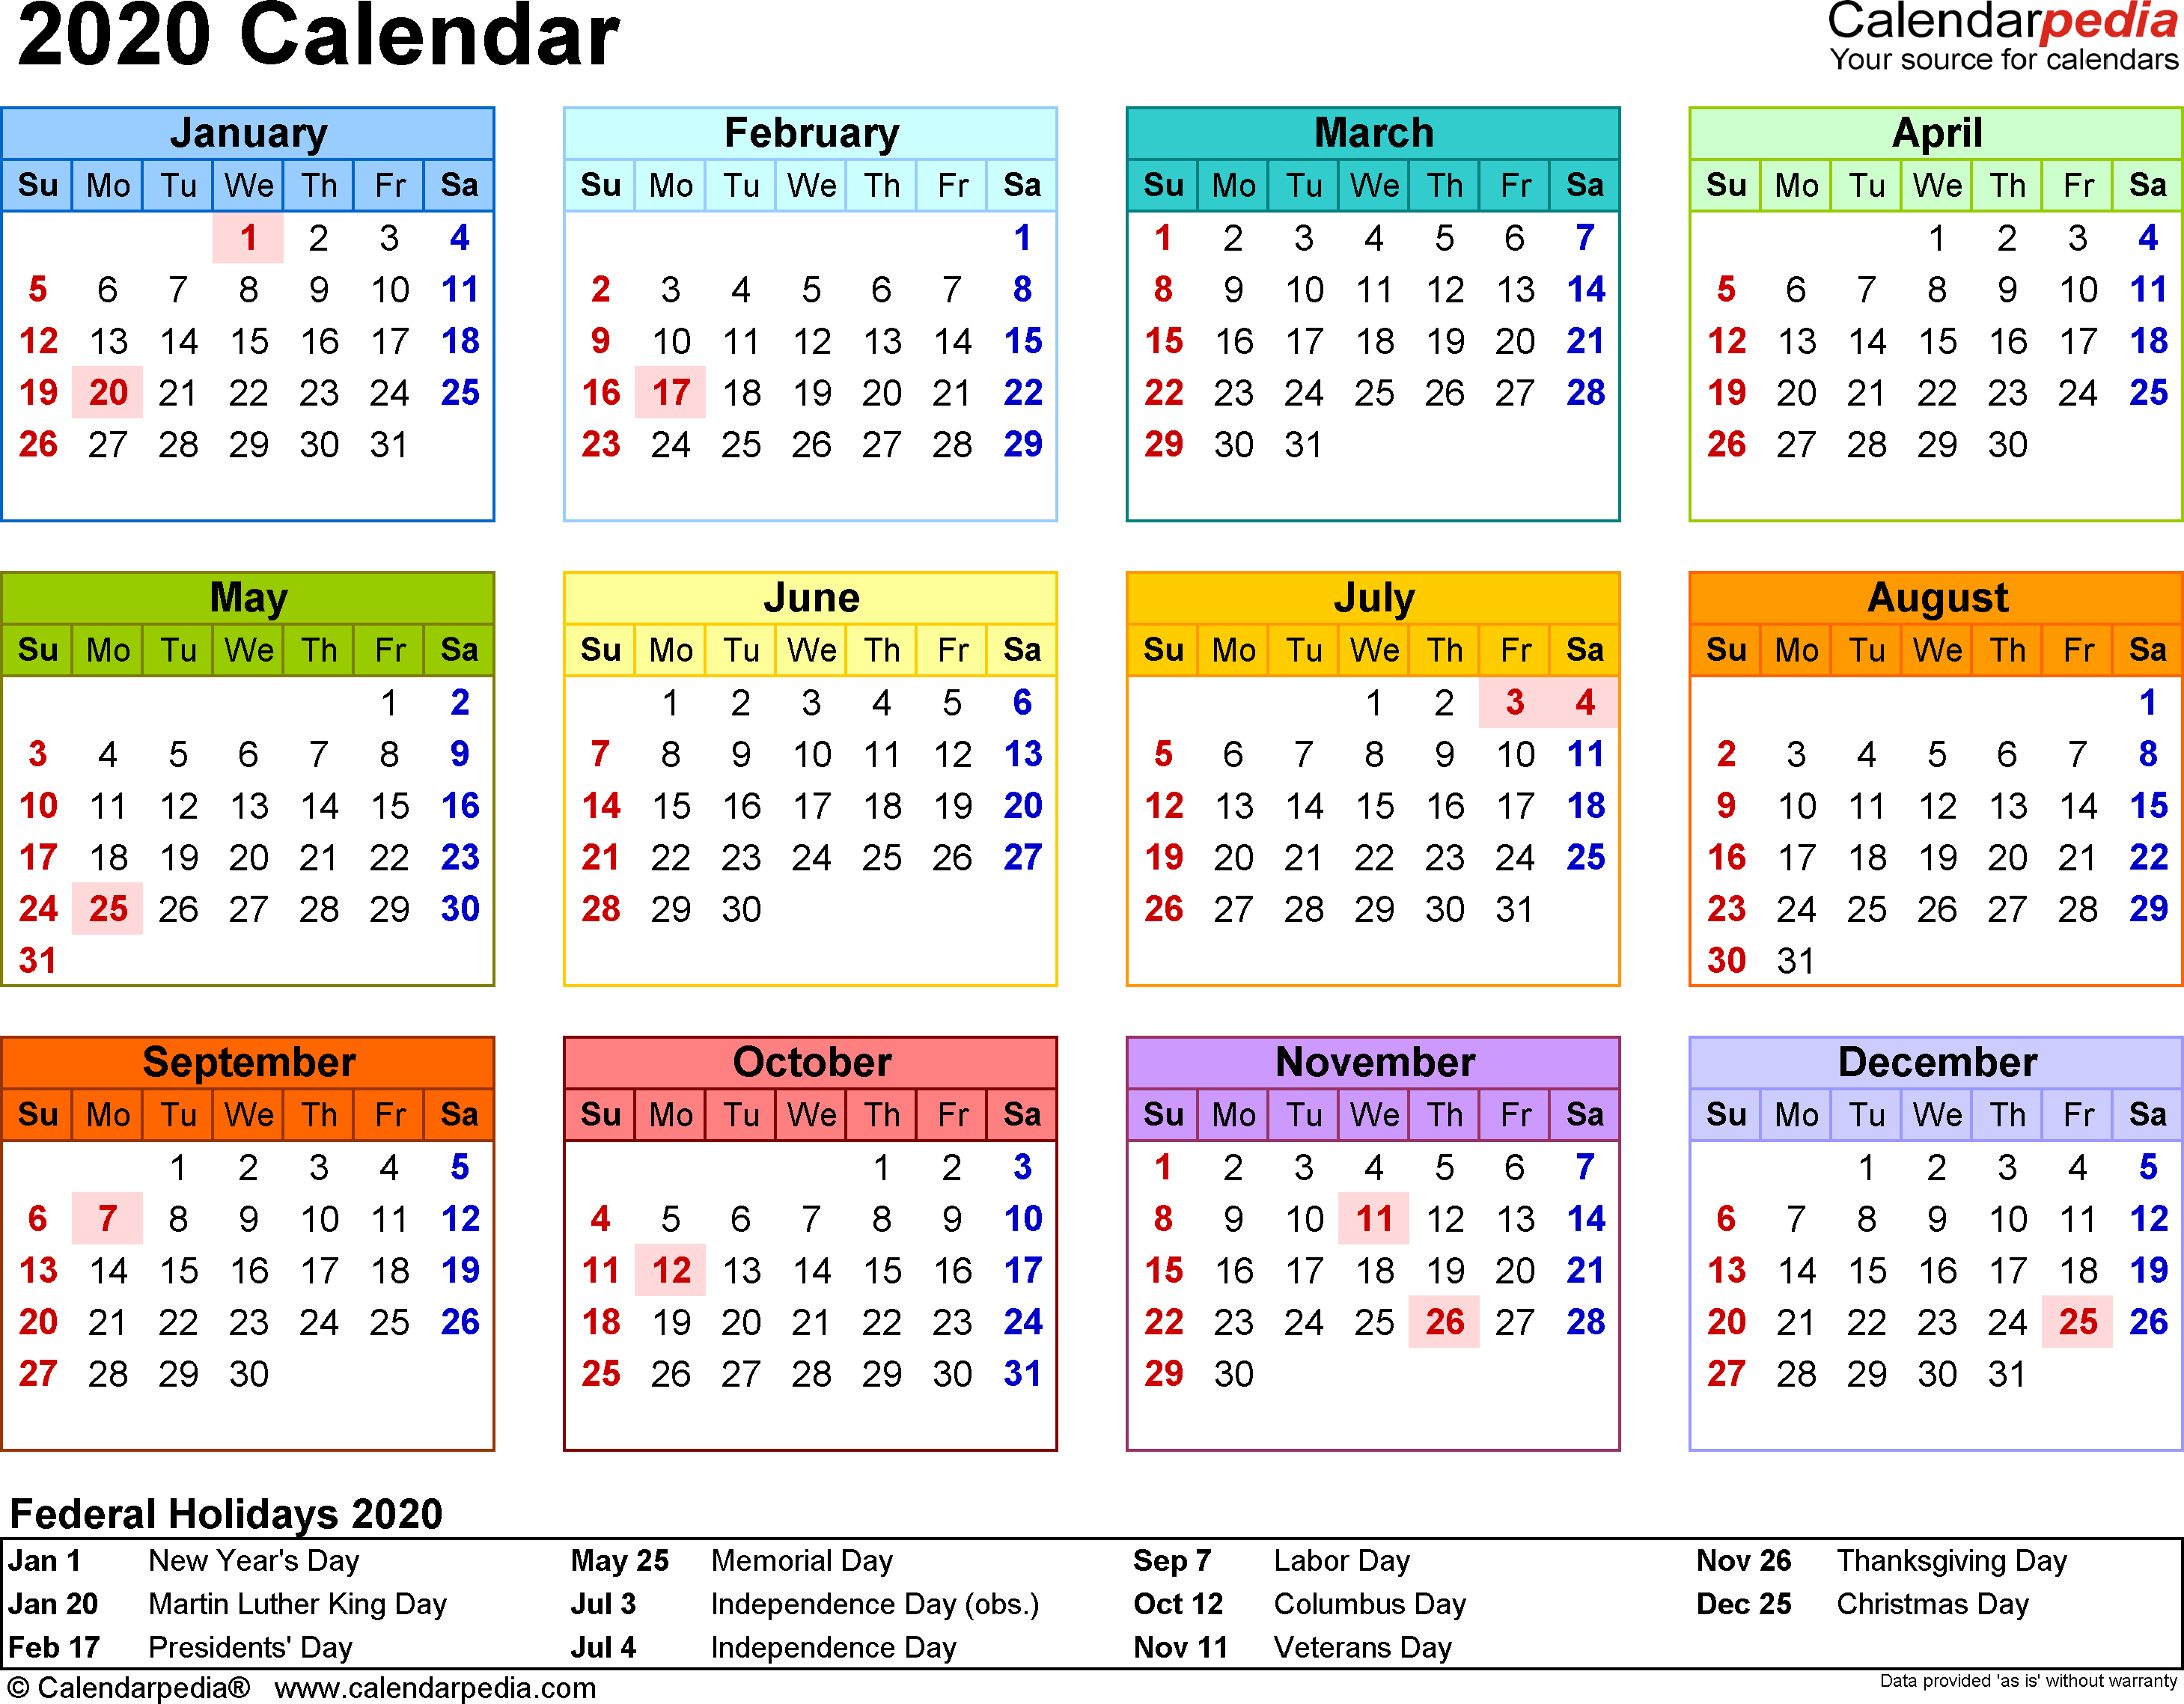 2020 Calendar - Free Printable Templates